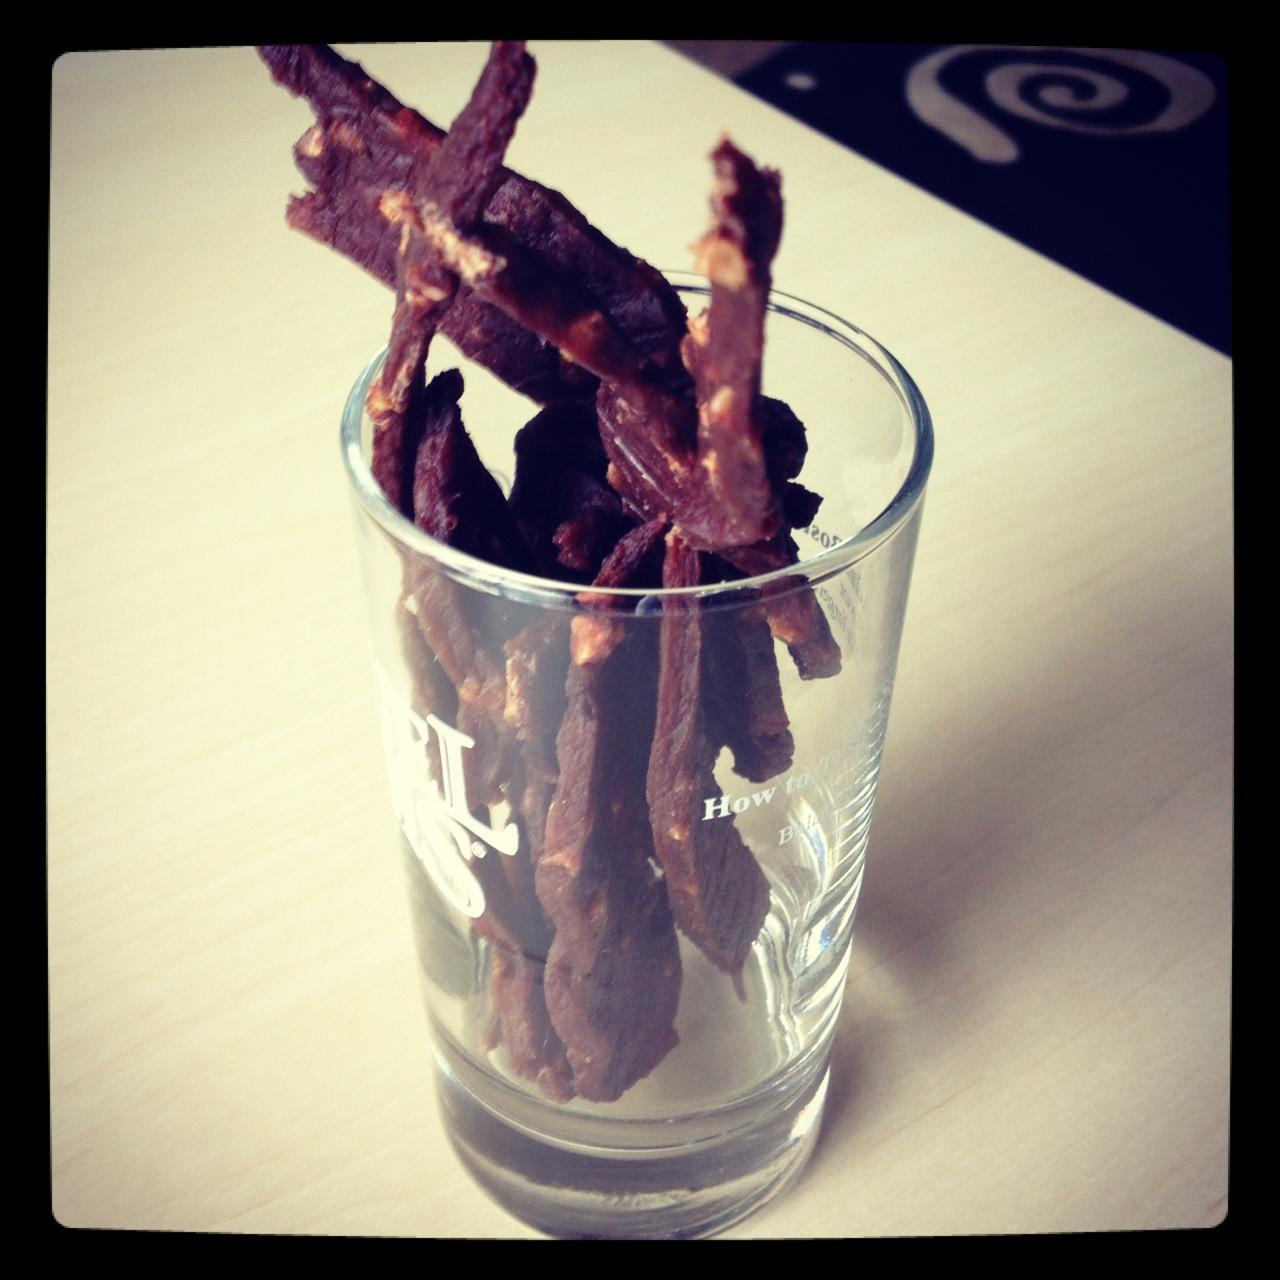 Homemade Peanut Chocolate Jerky